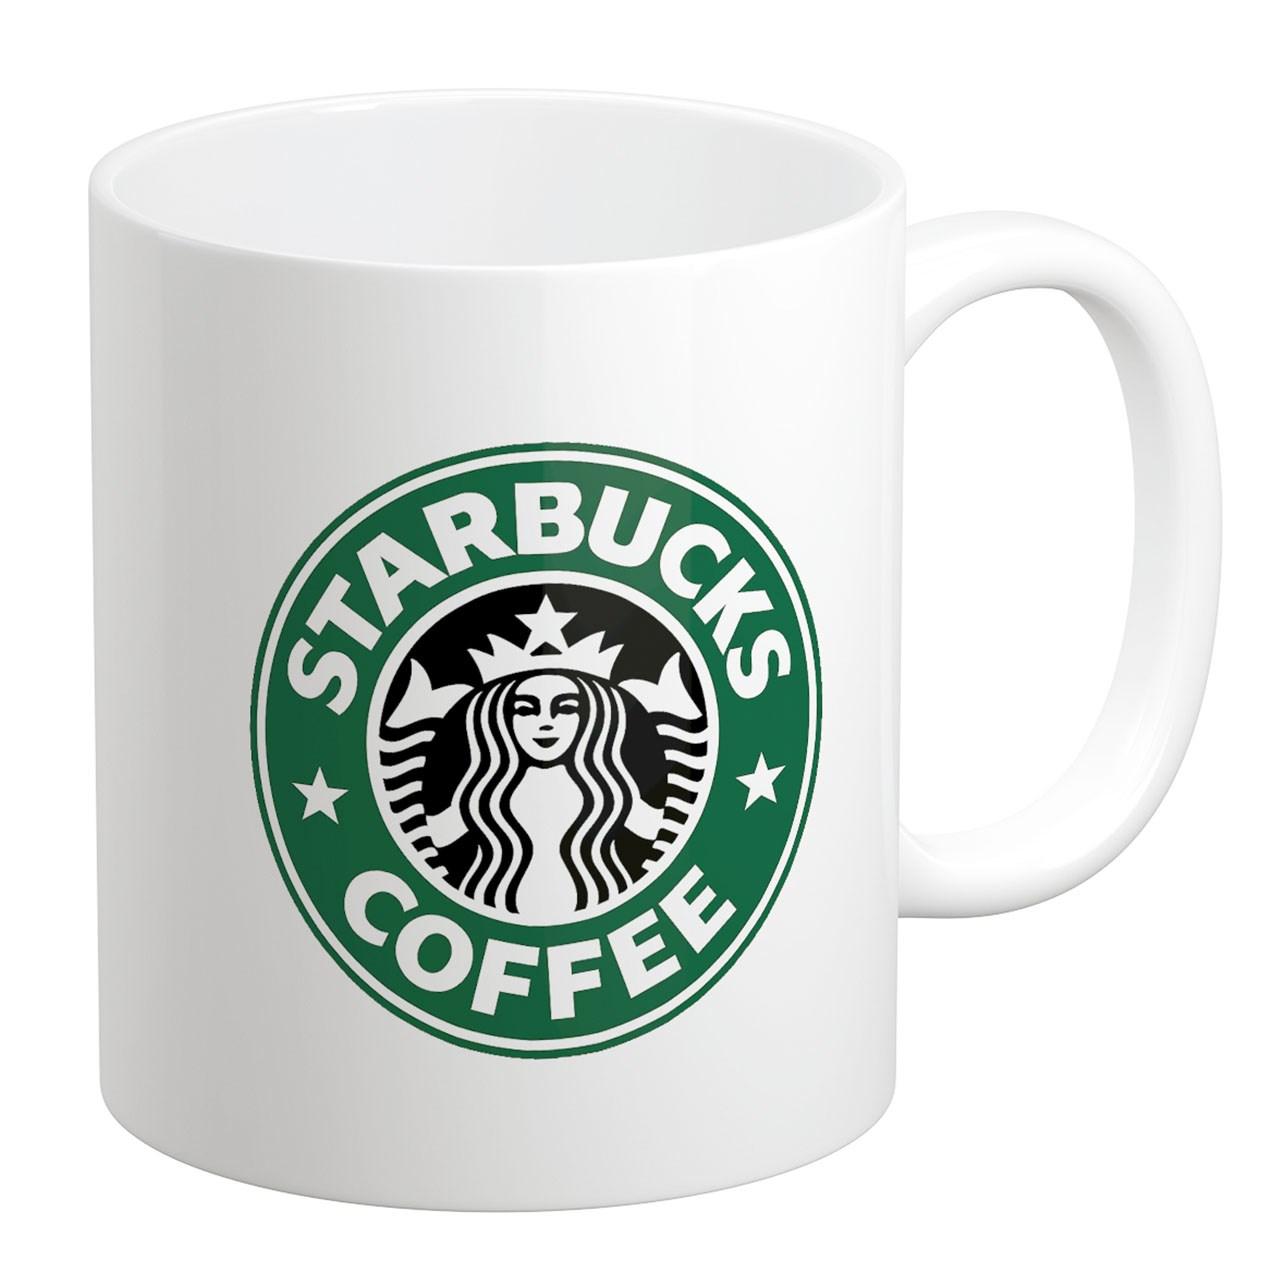 ماگ لومانا مدل Starbucks کد L1248